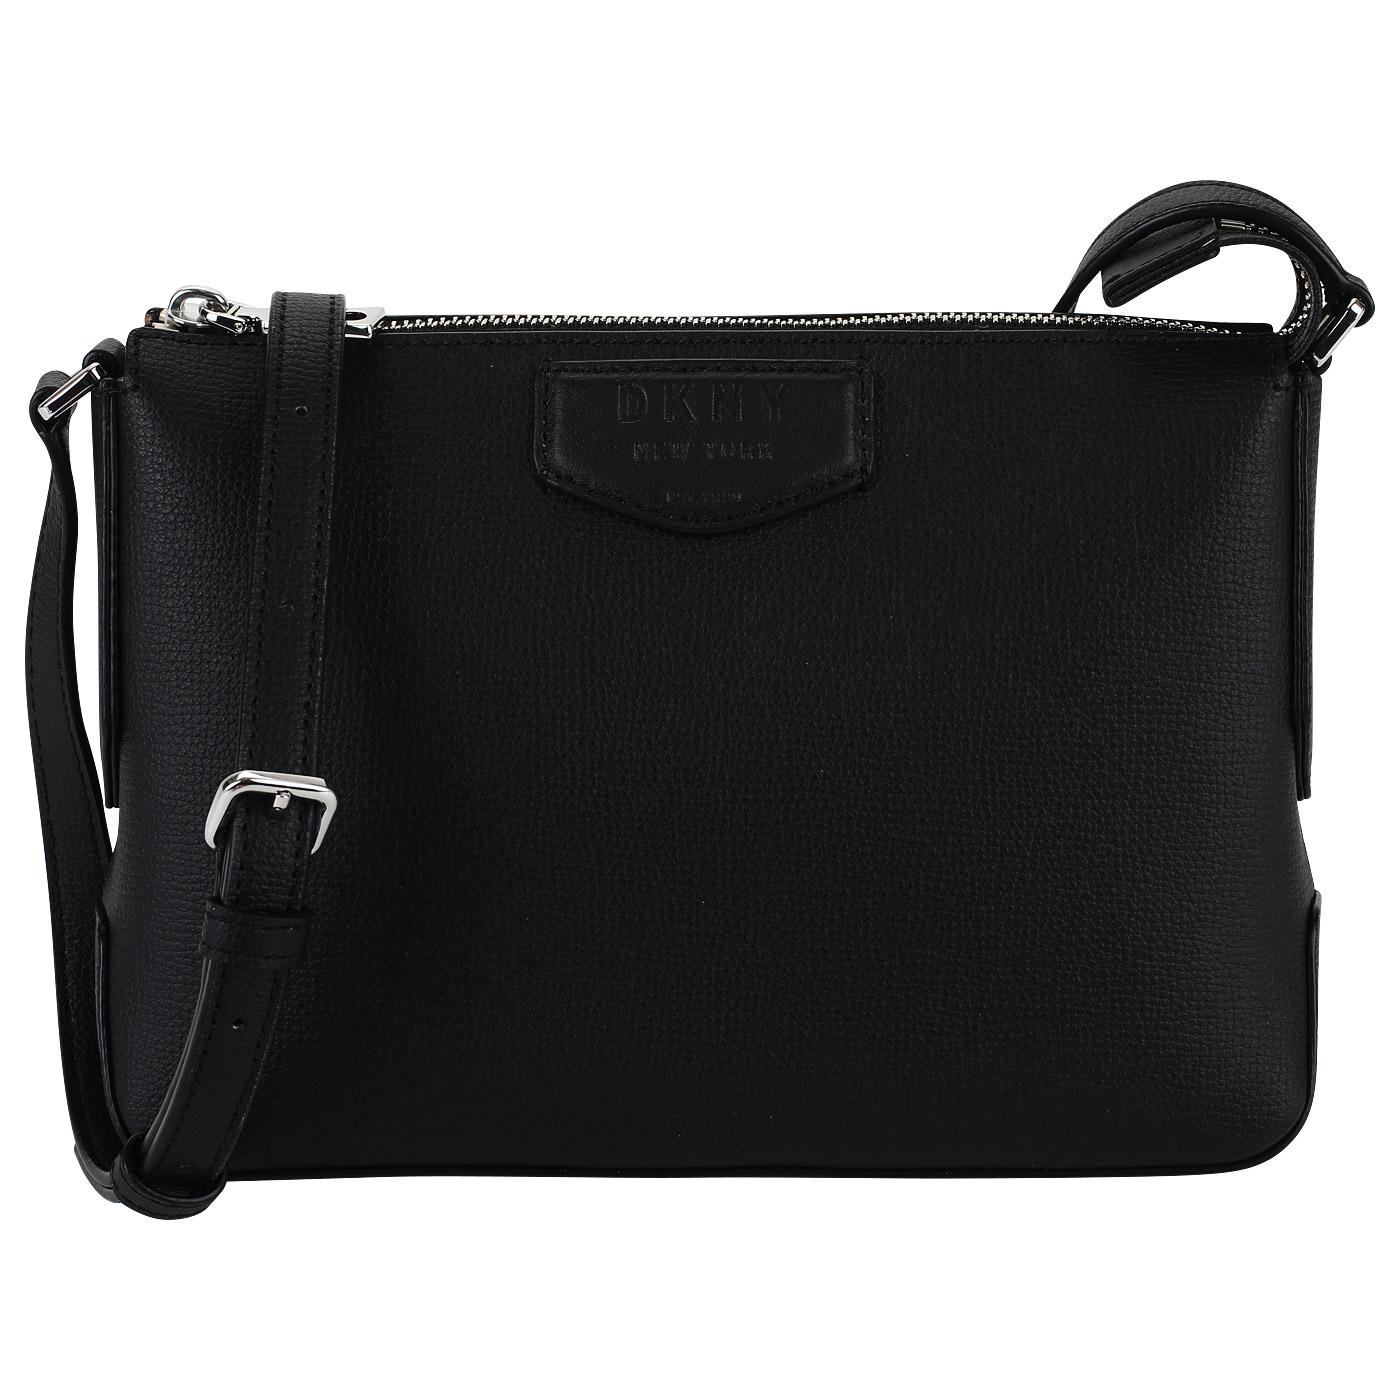 2b3029d4f157 Черная кожаная сумочка DKNY Sullivan R83E8821-B3L - 2000557994713 ...